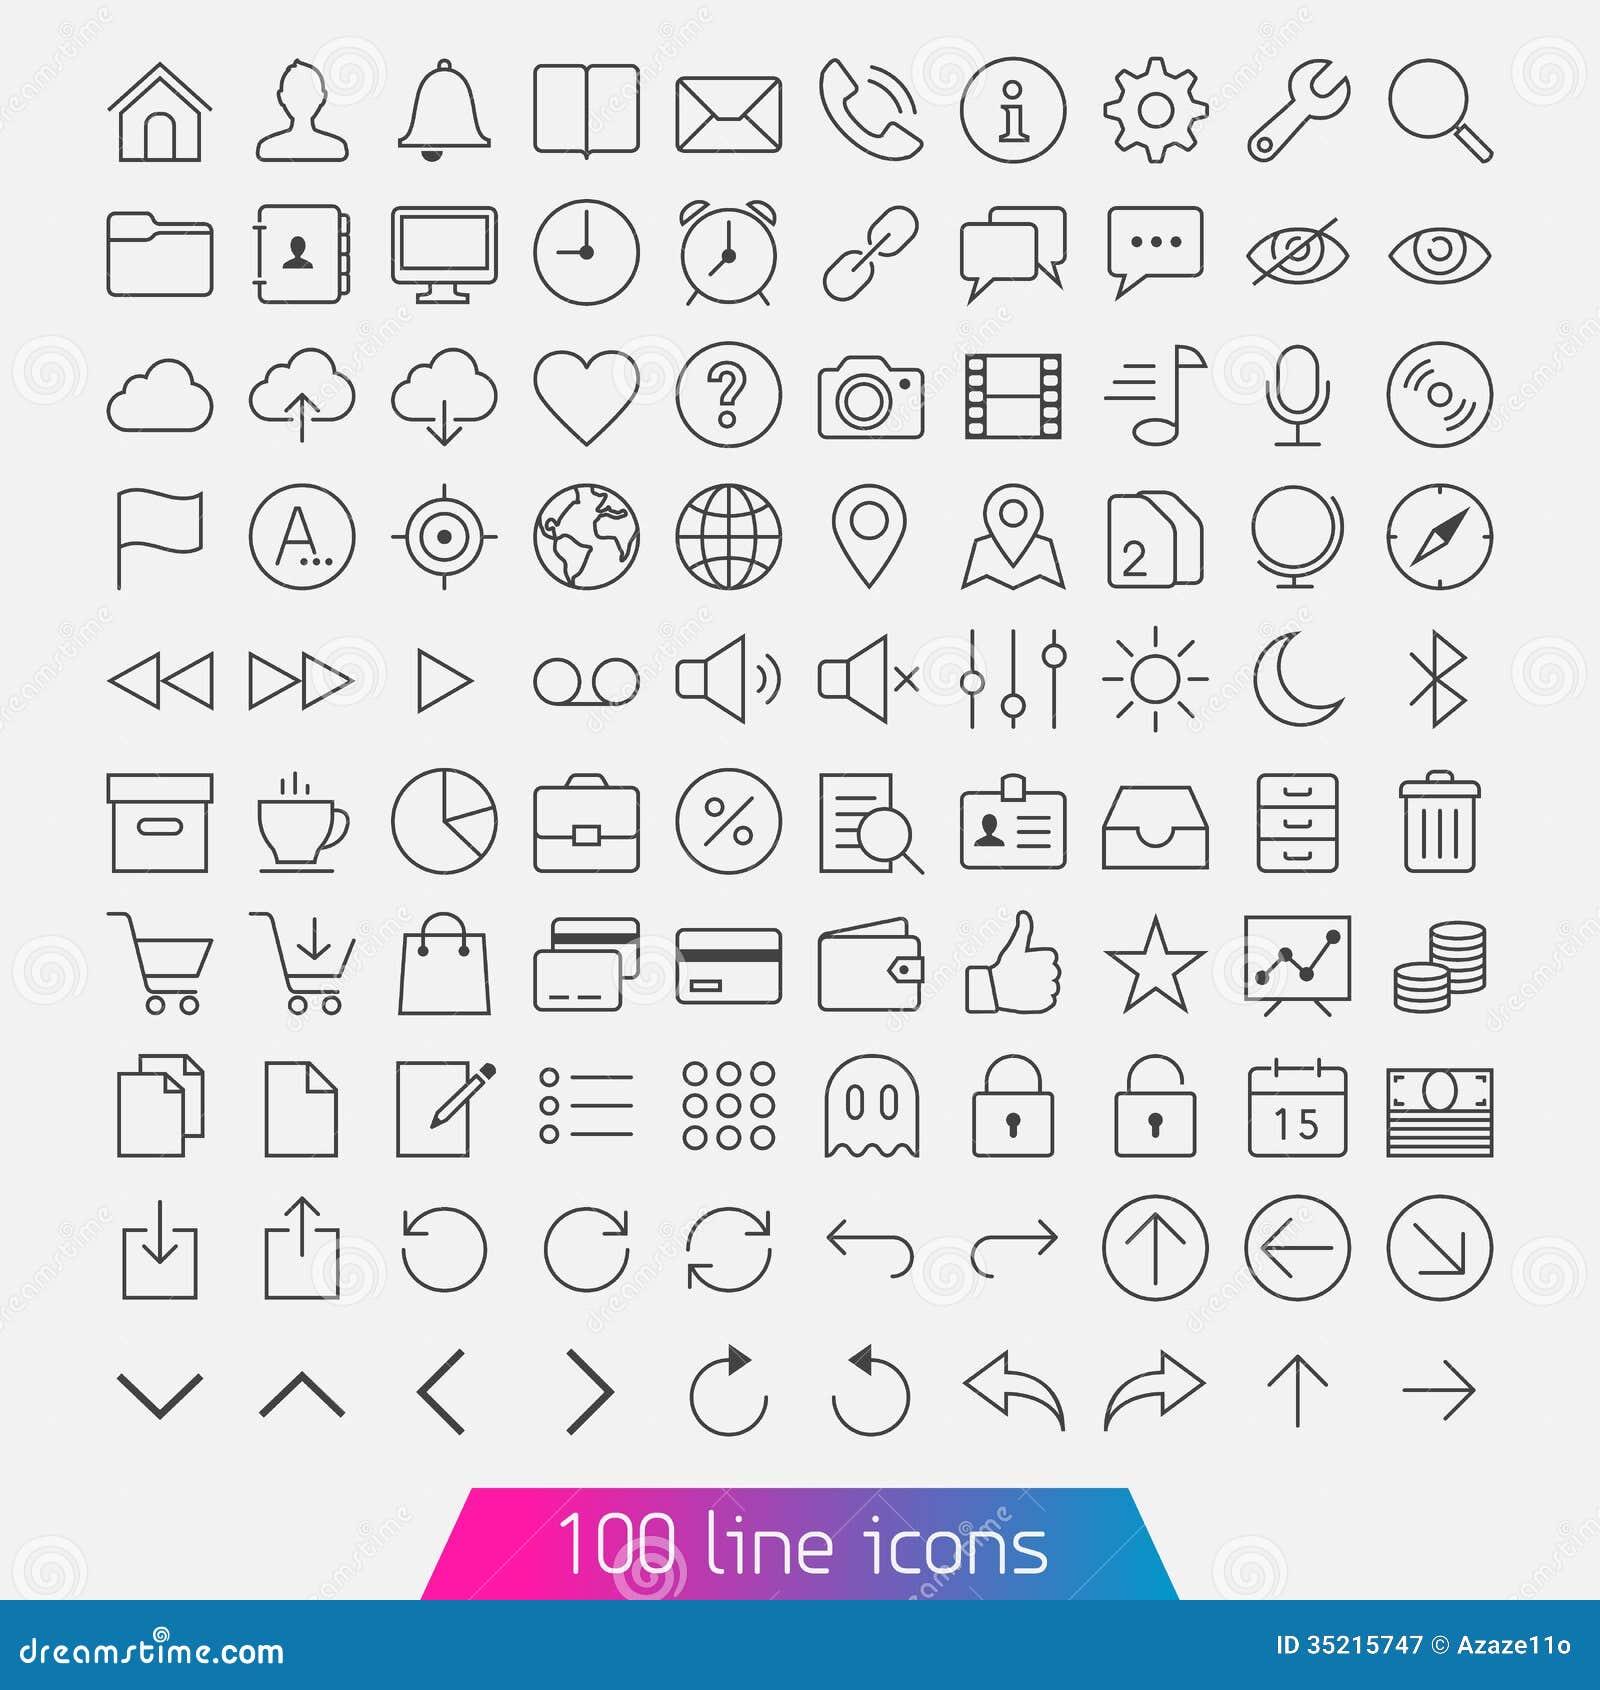 100 line icon set